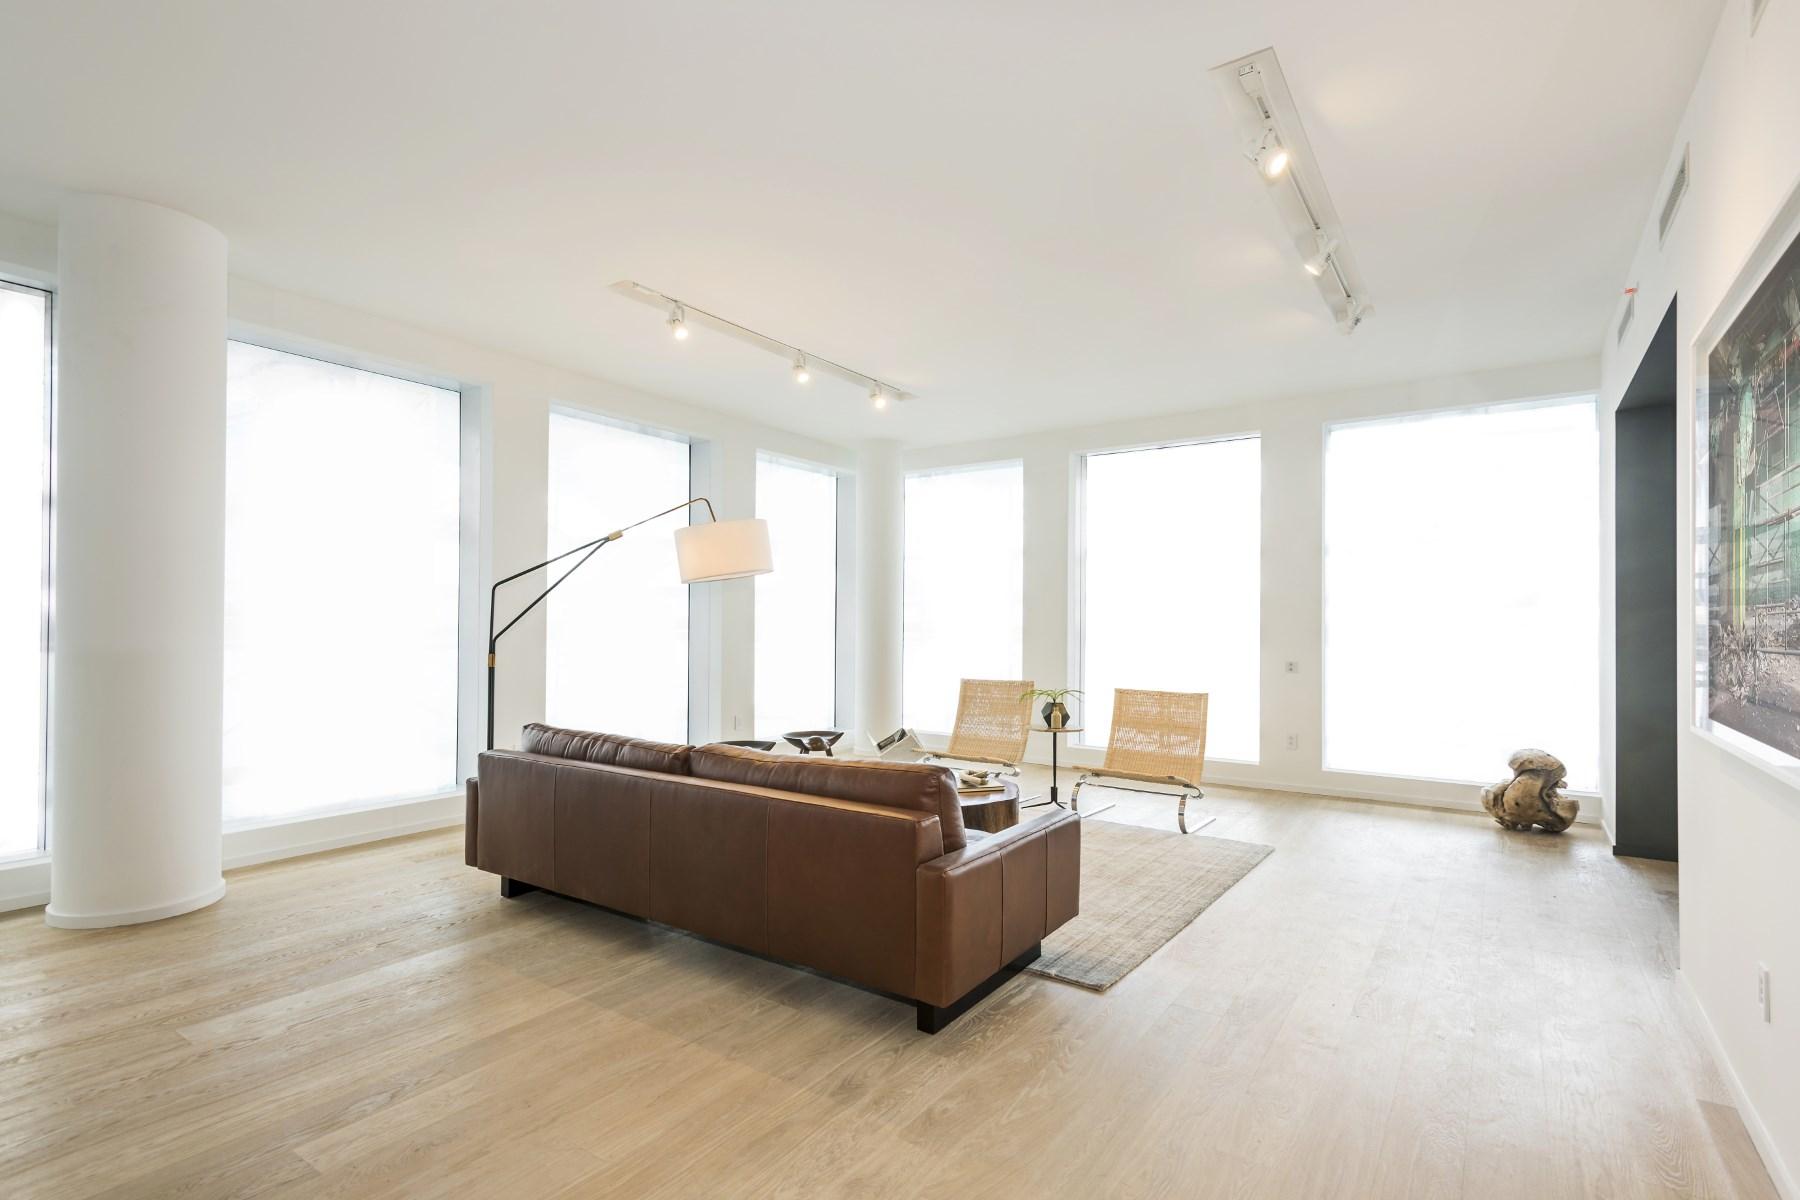 Condominium for Sale at 1 John Street, 8B 1 John Street Apt 8B Dumbo, Brooklyn, New York, 11201 United States